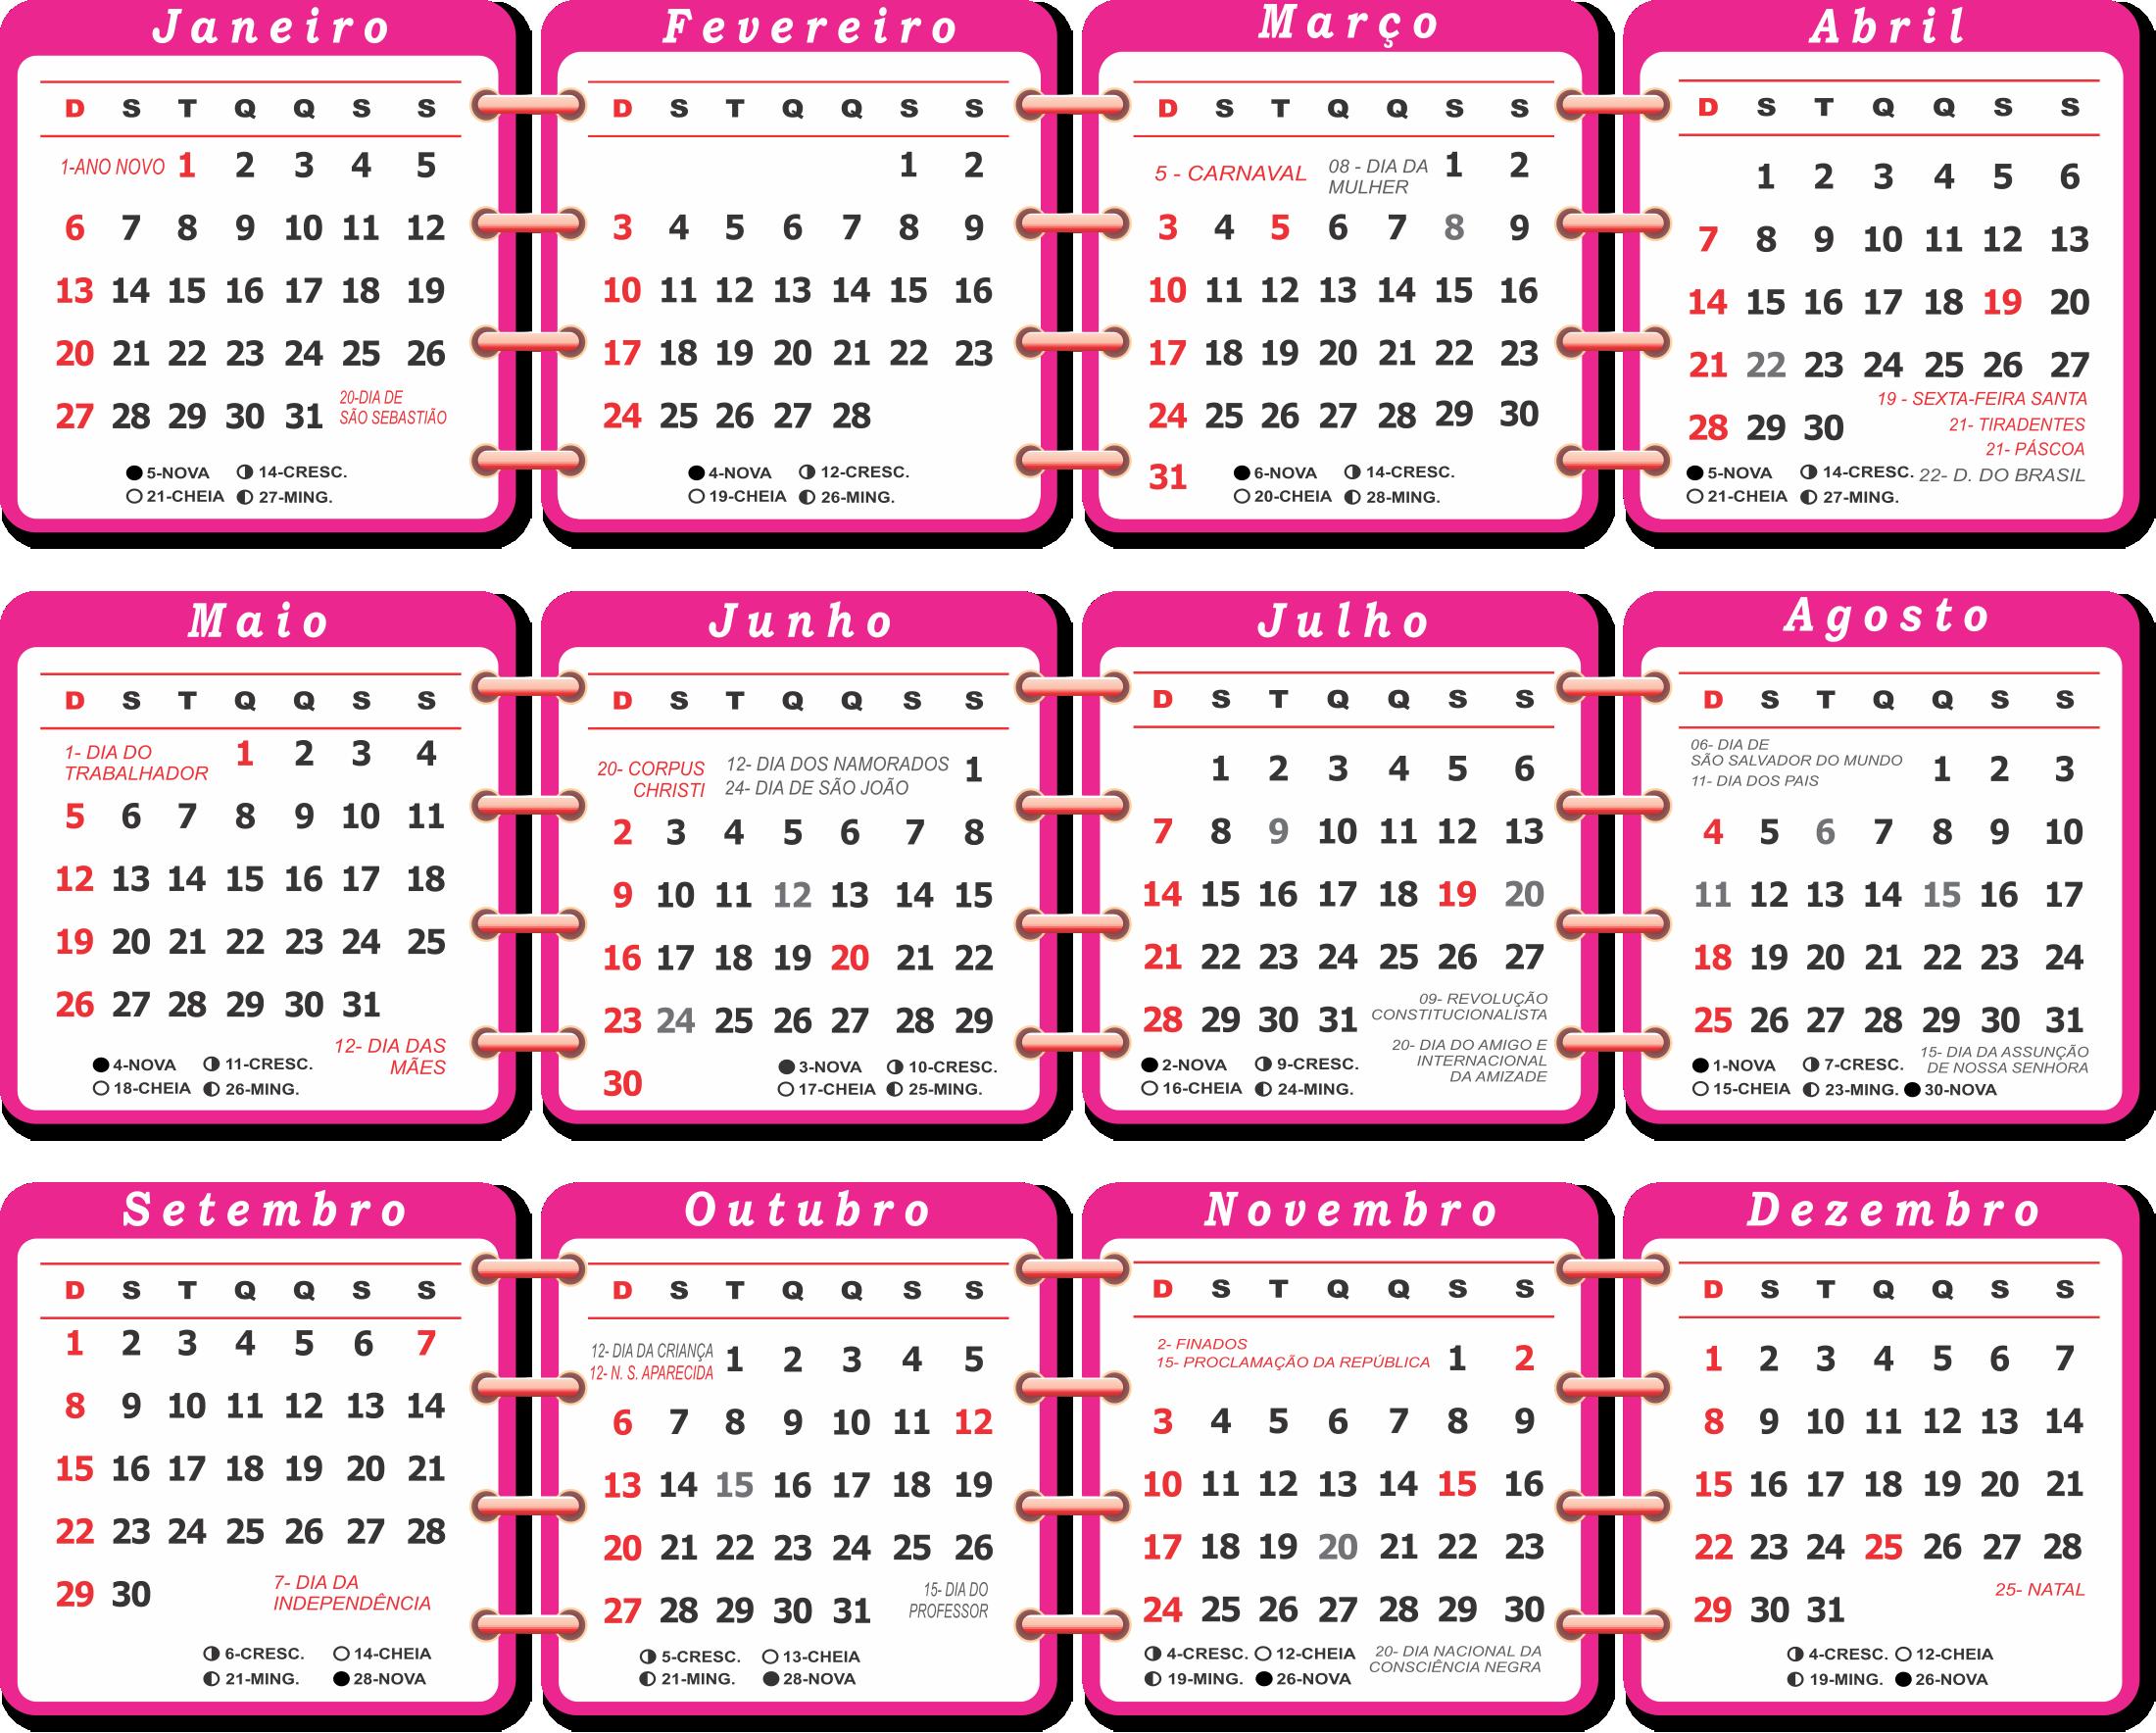 Calendario Rosa Png.Download Hd Base Calenda Rio 2019 Rosa Calendario 2019 Com